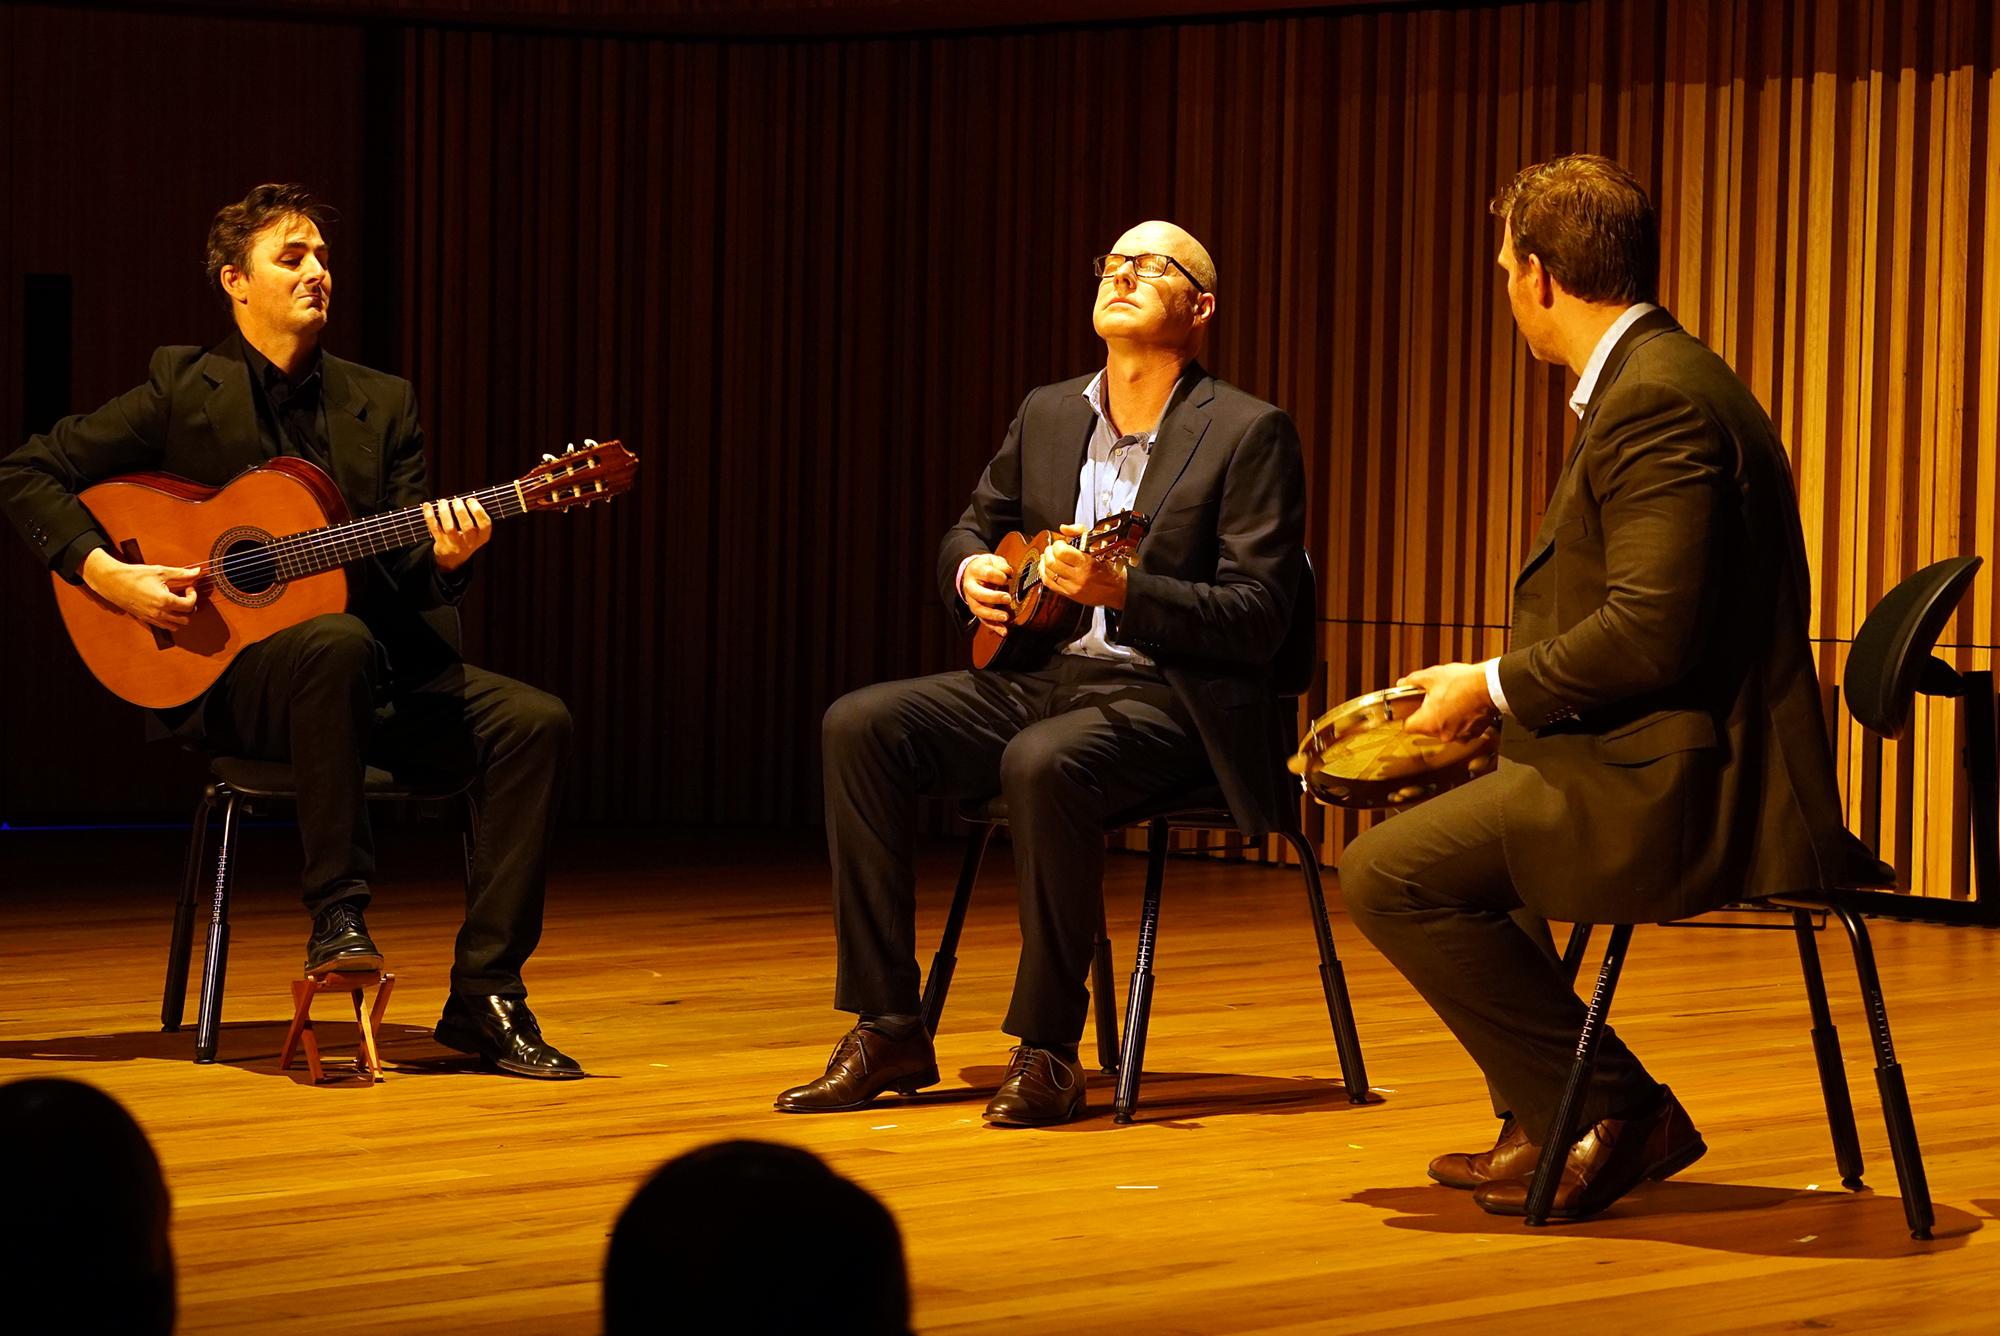 DSC04124_CC1 Trio Agogo.jpg